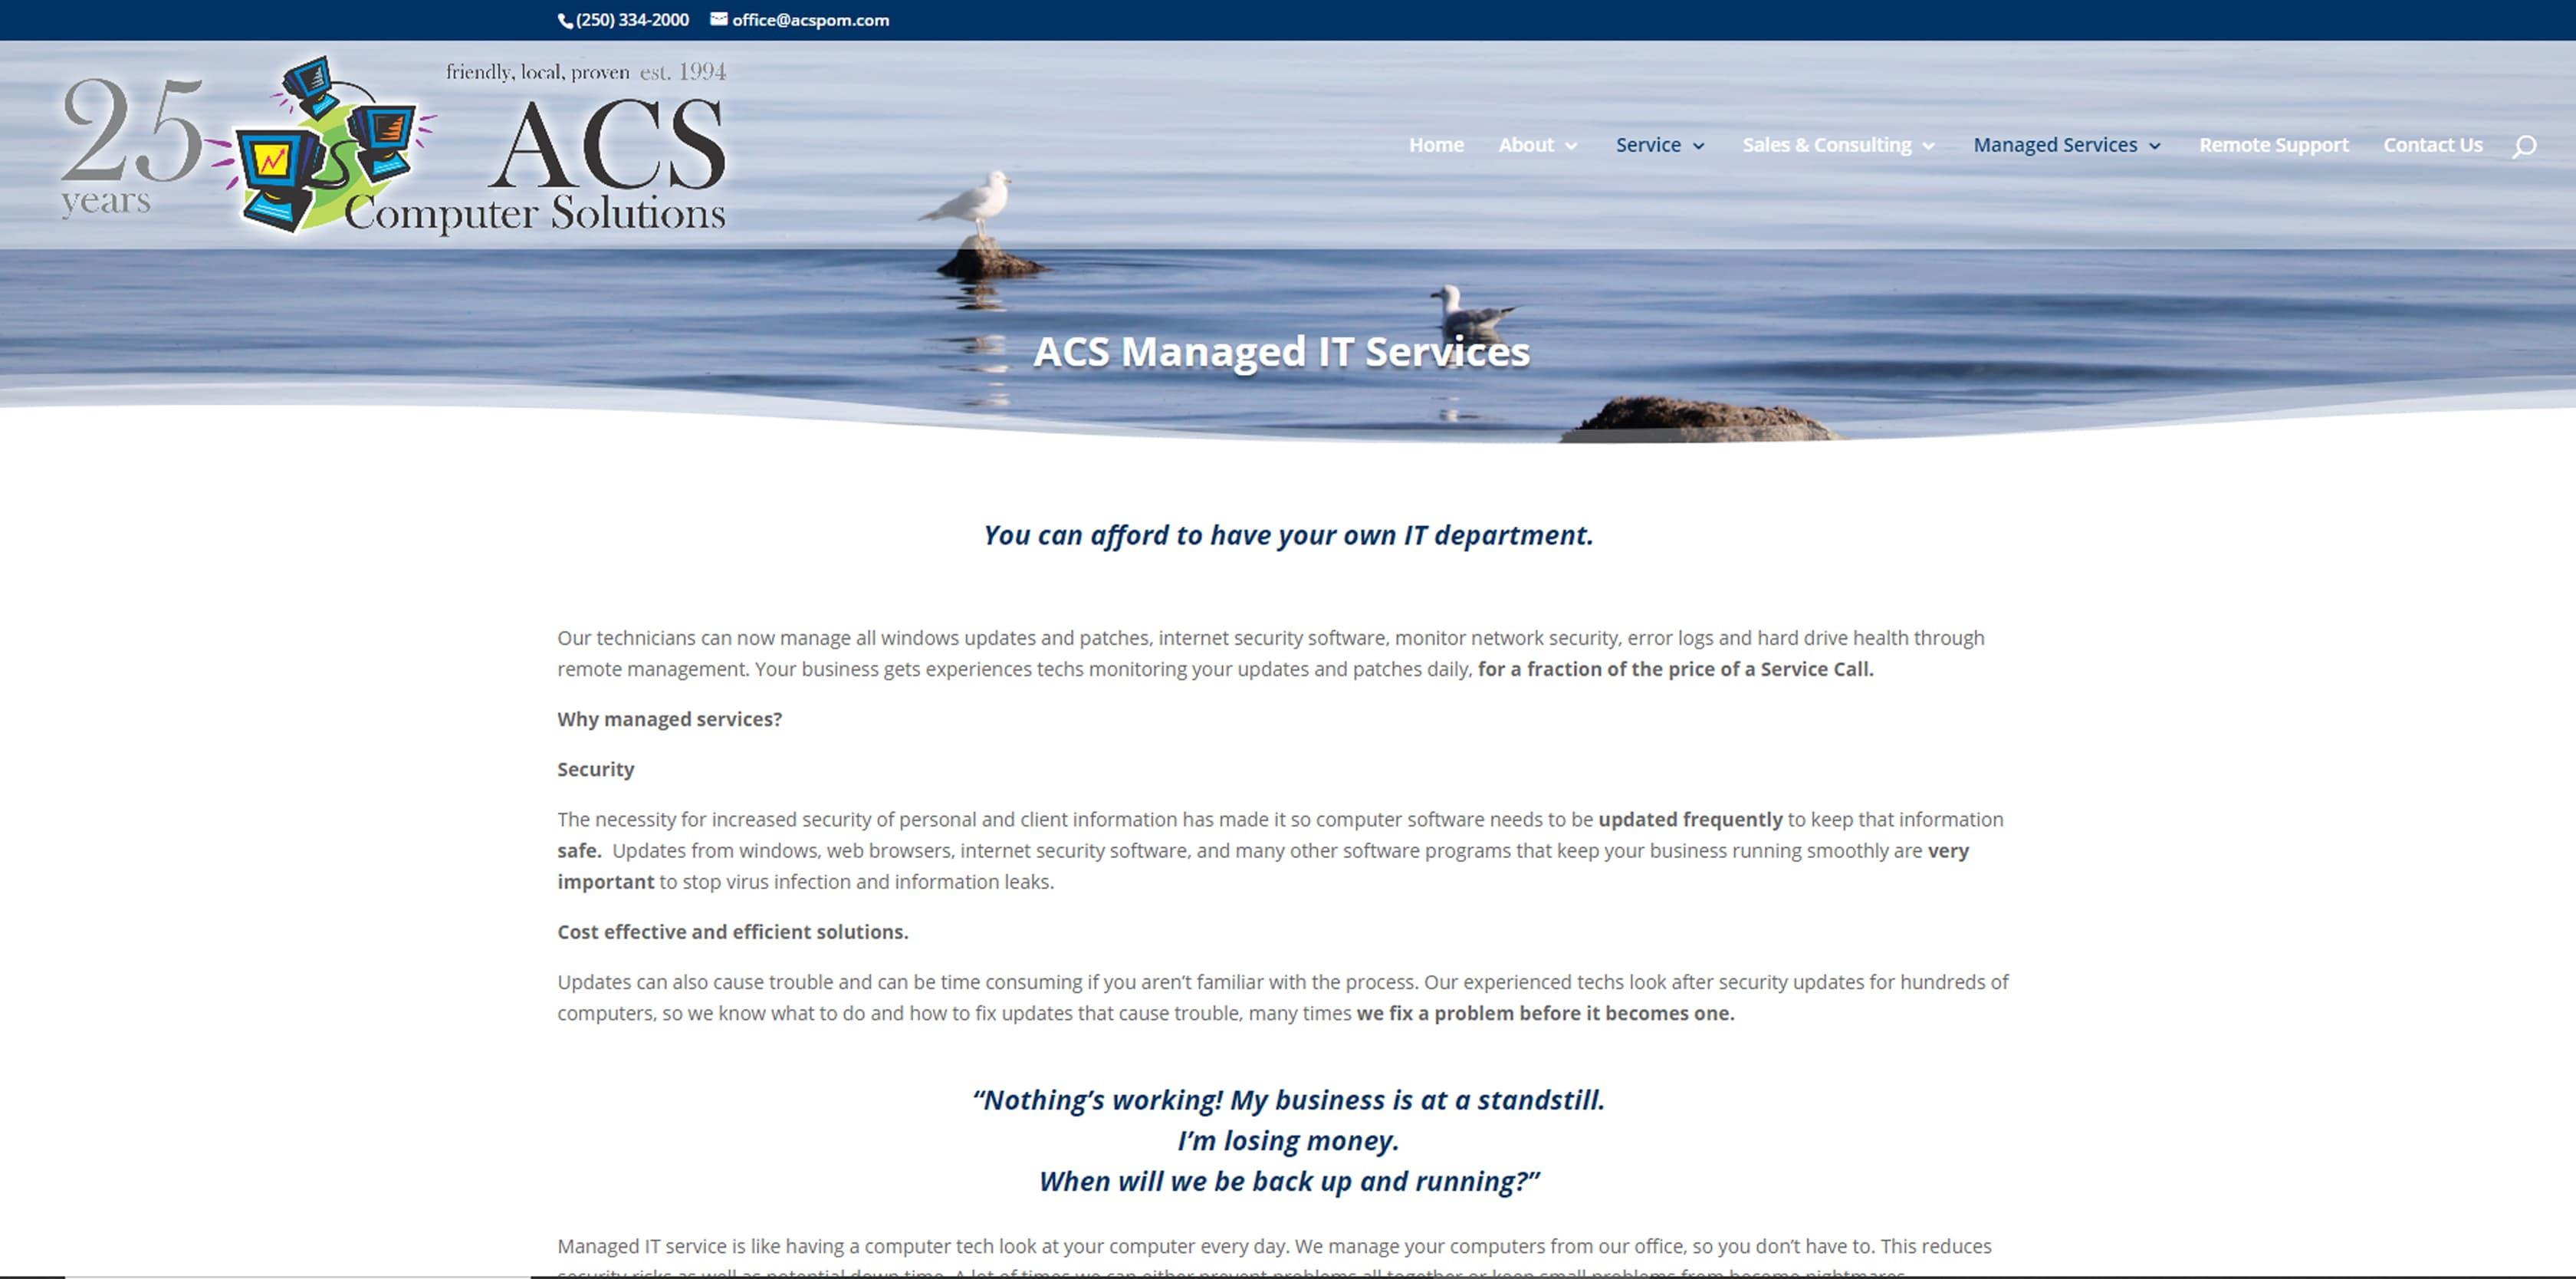 ACS Computer Solutions, Courtenay, BC